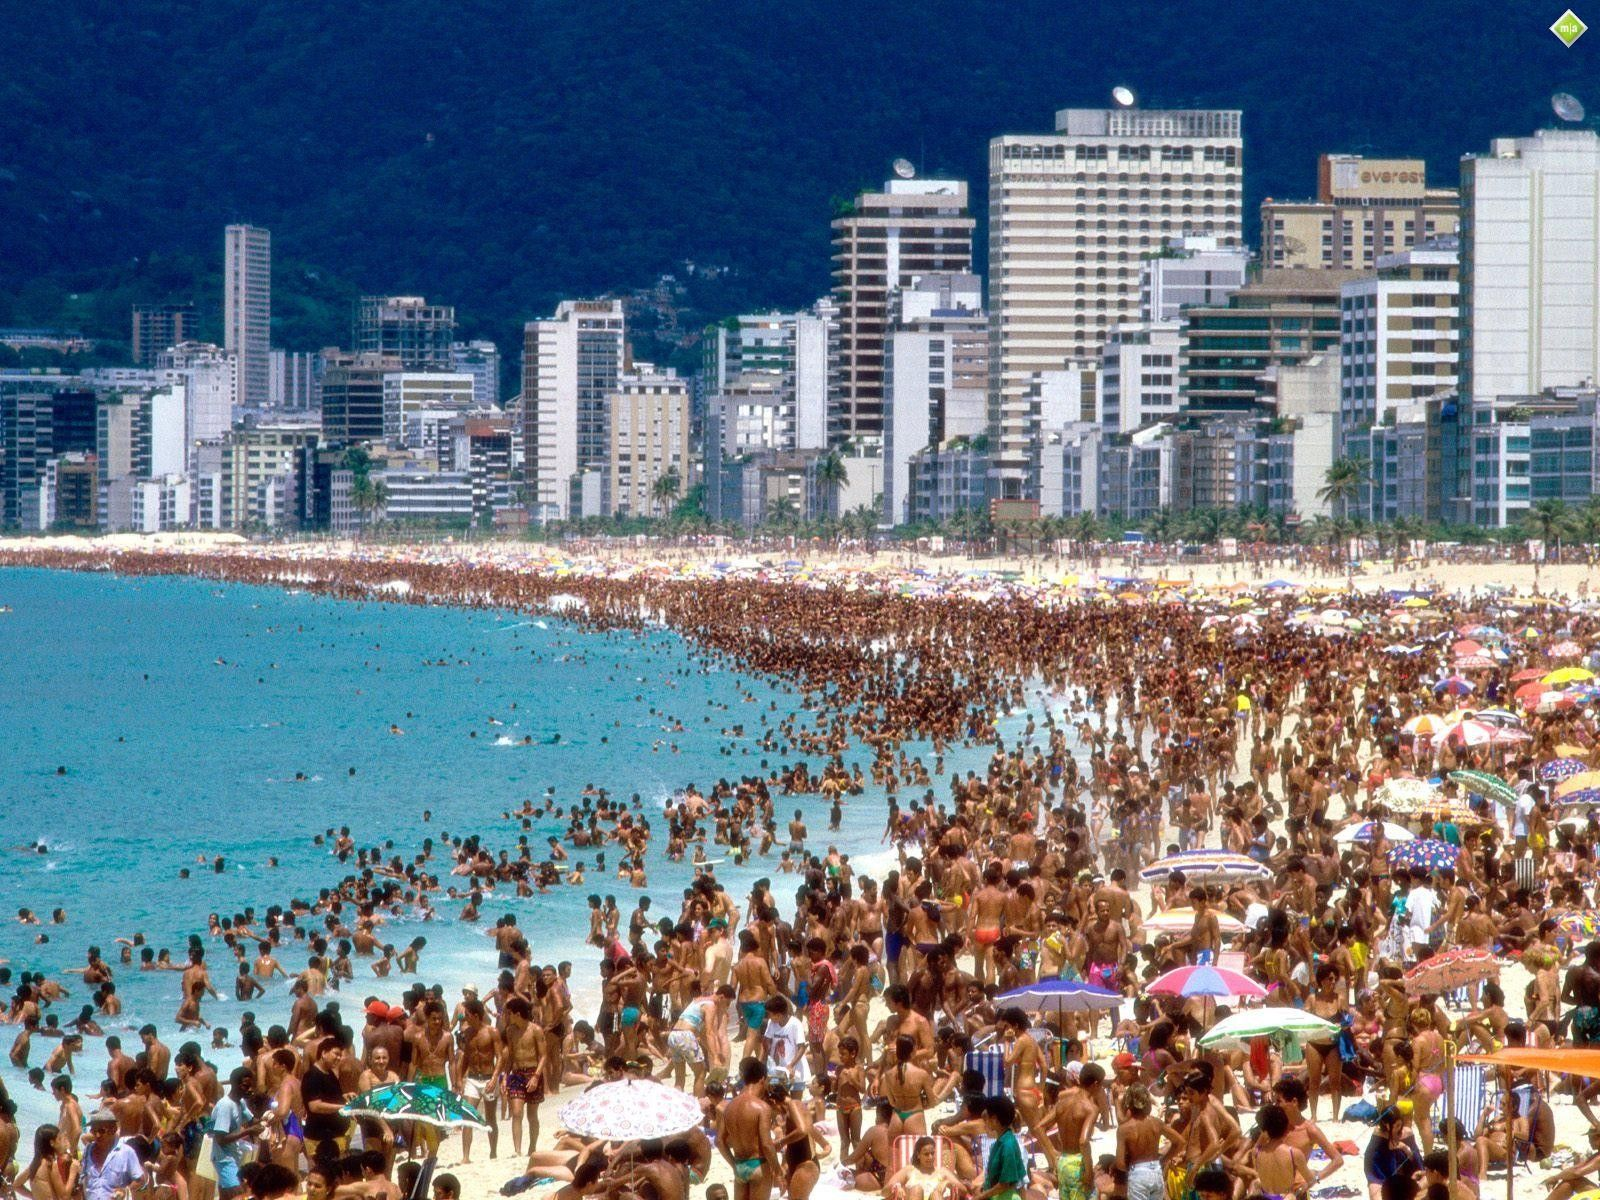 paulo brazil beach Sao